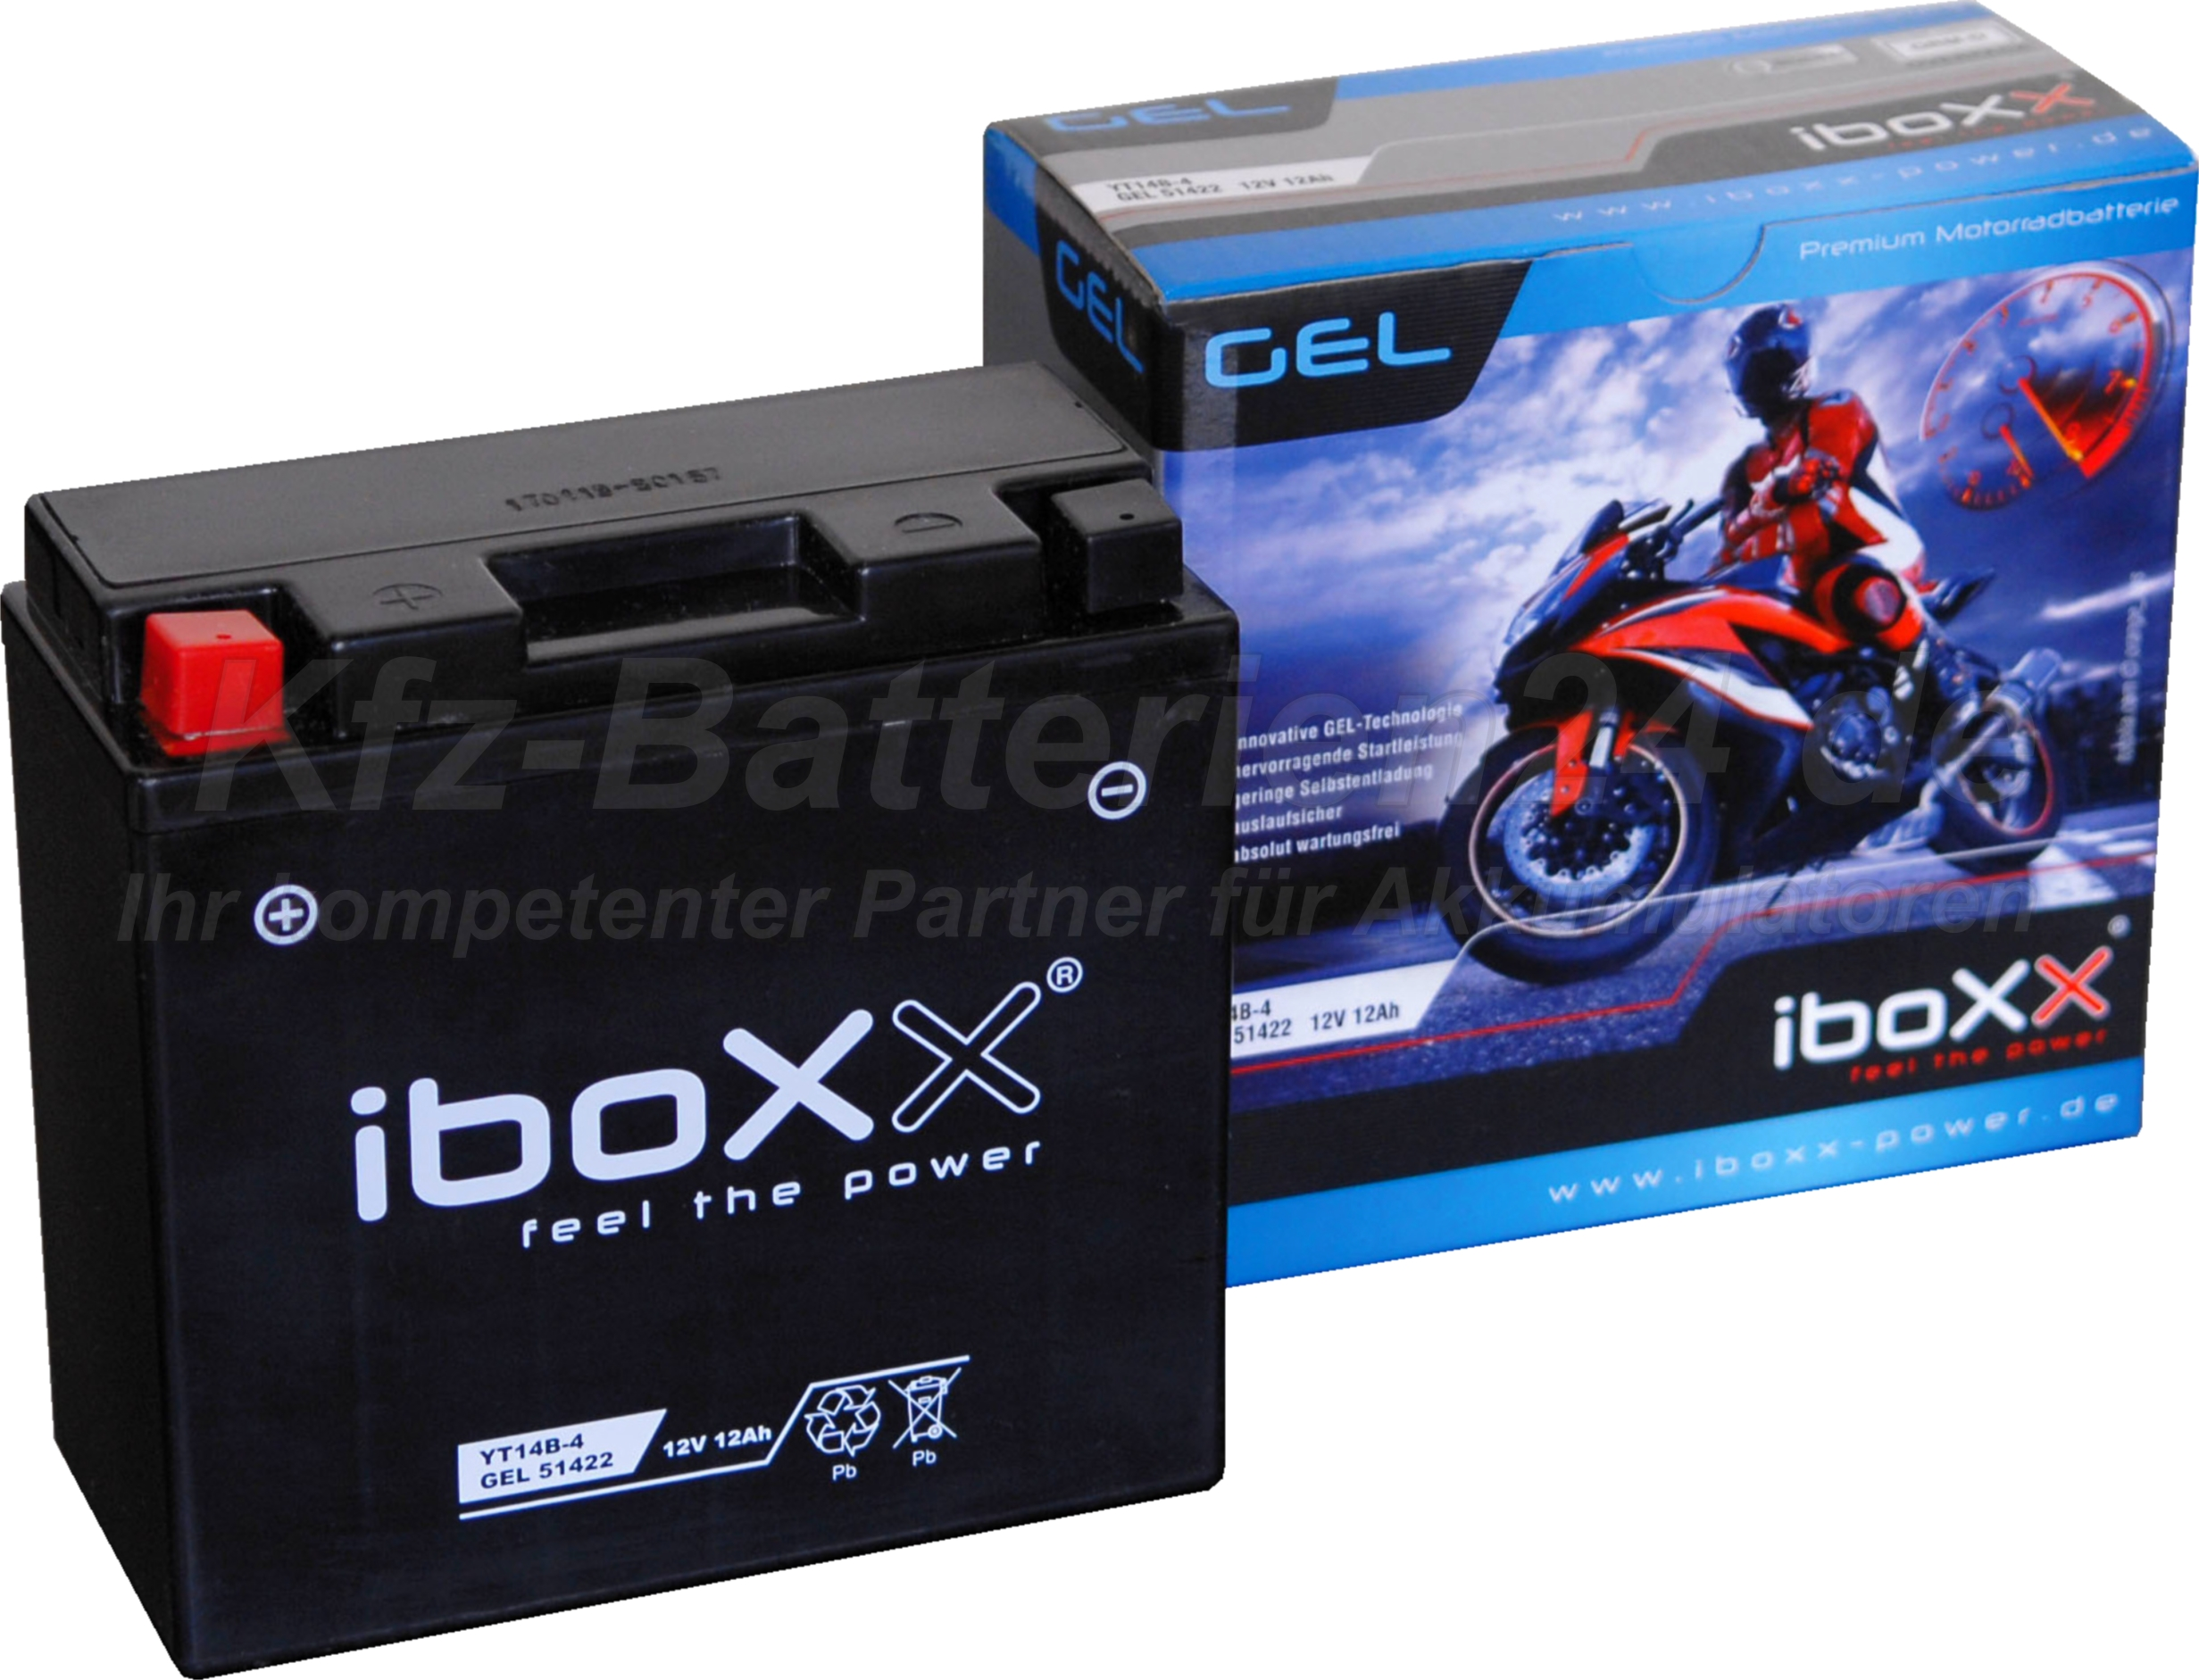 GEL Motorradbatterie 12V 12Ah 51422 YT1B-4 Gelbatterie